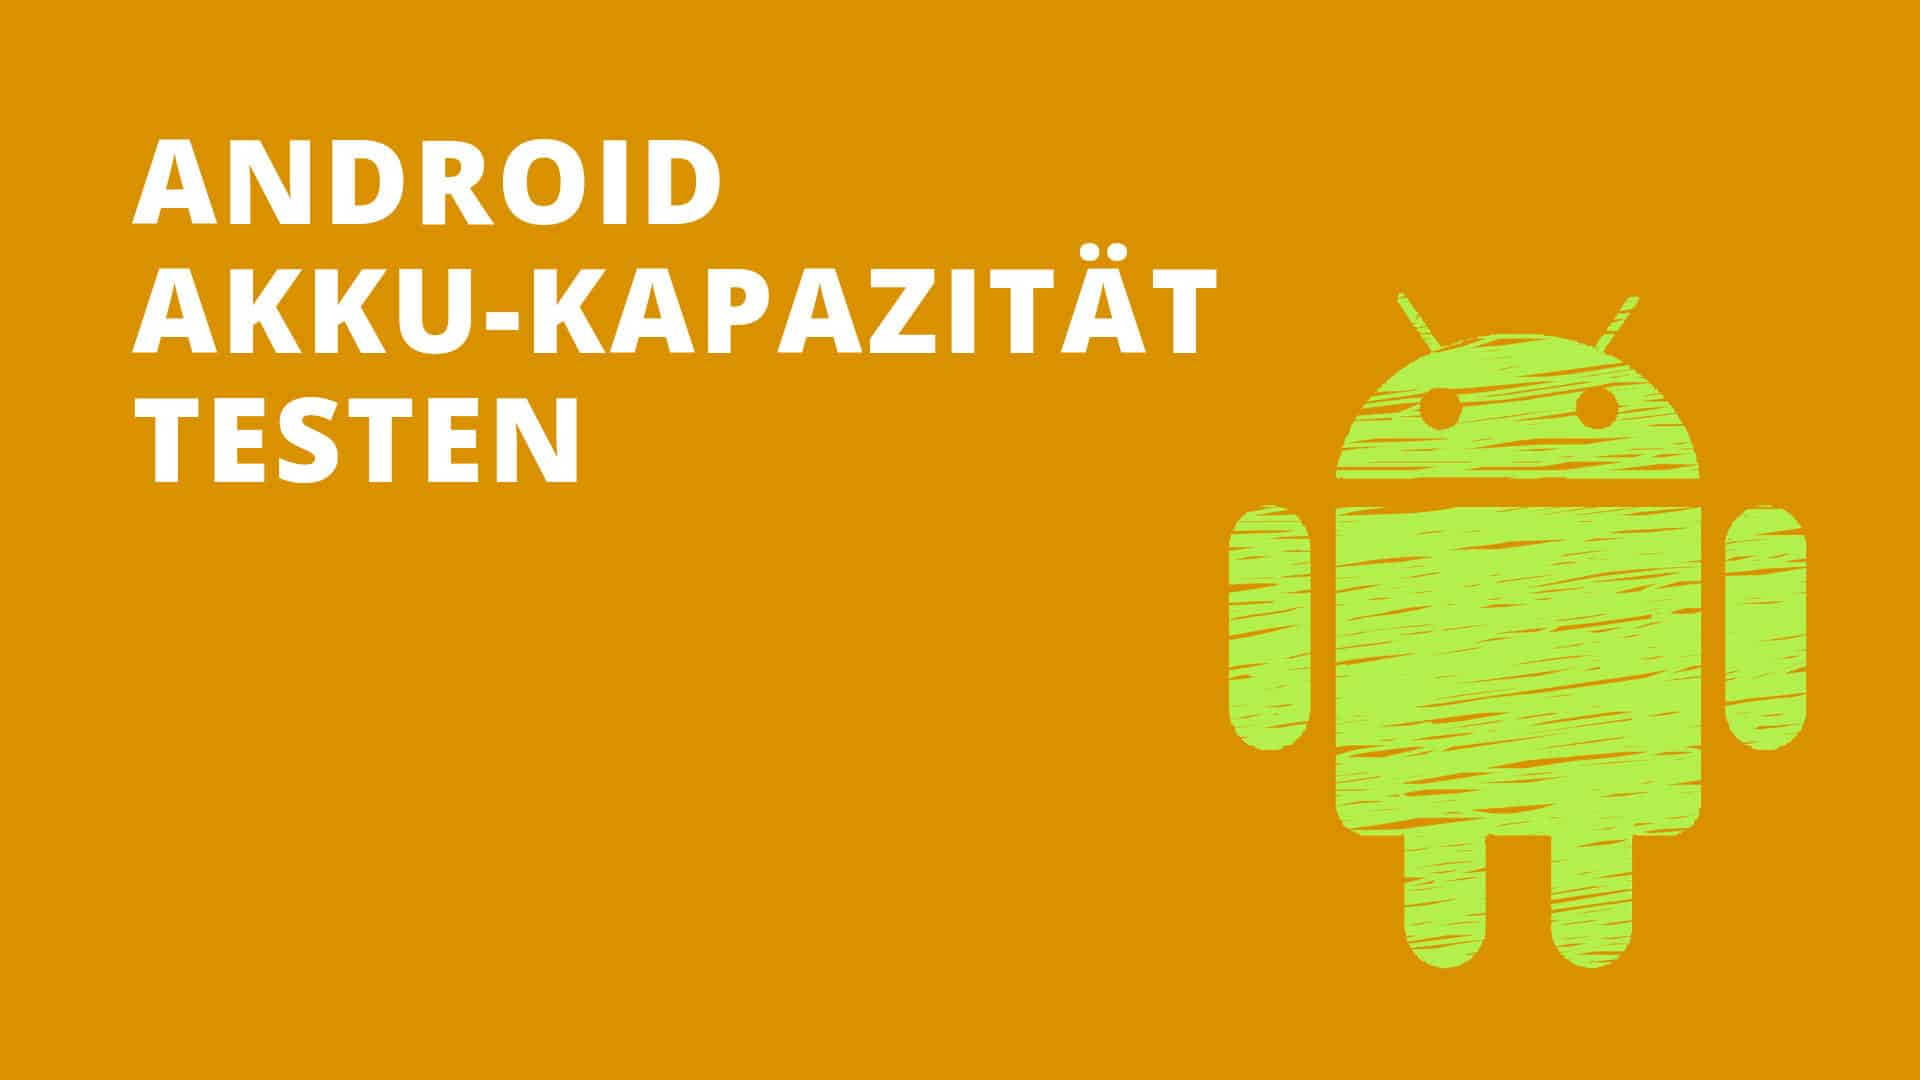 android akku kapazit t testen beste apps um akkuzustand auszulesen. Black Bedroom Furniture Sets. Home Design Ideas